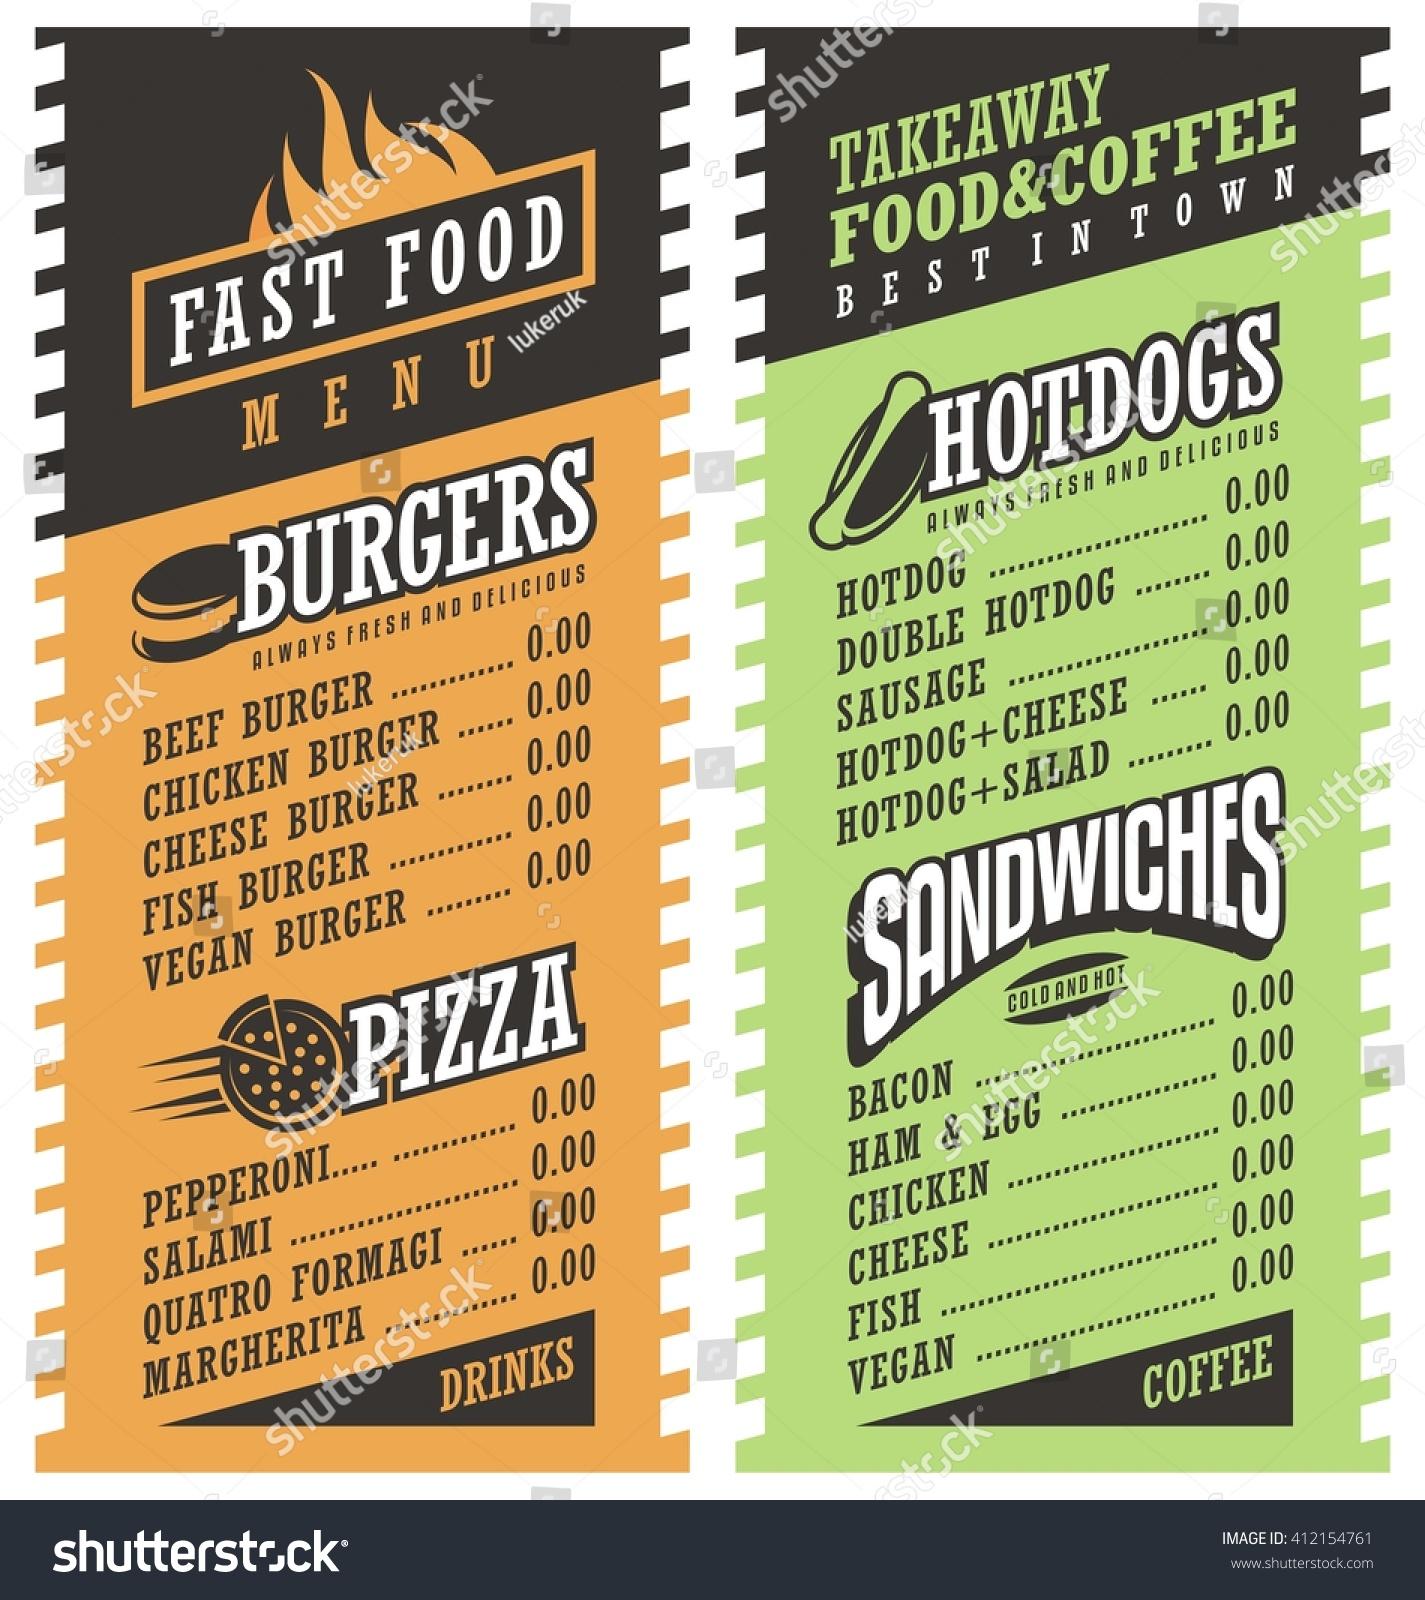 Fast food simple menu design template stock vector for Simple html menu template